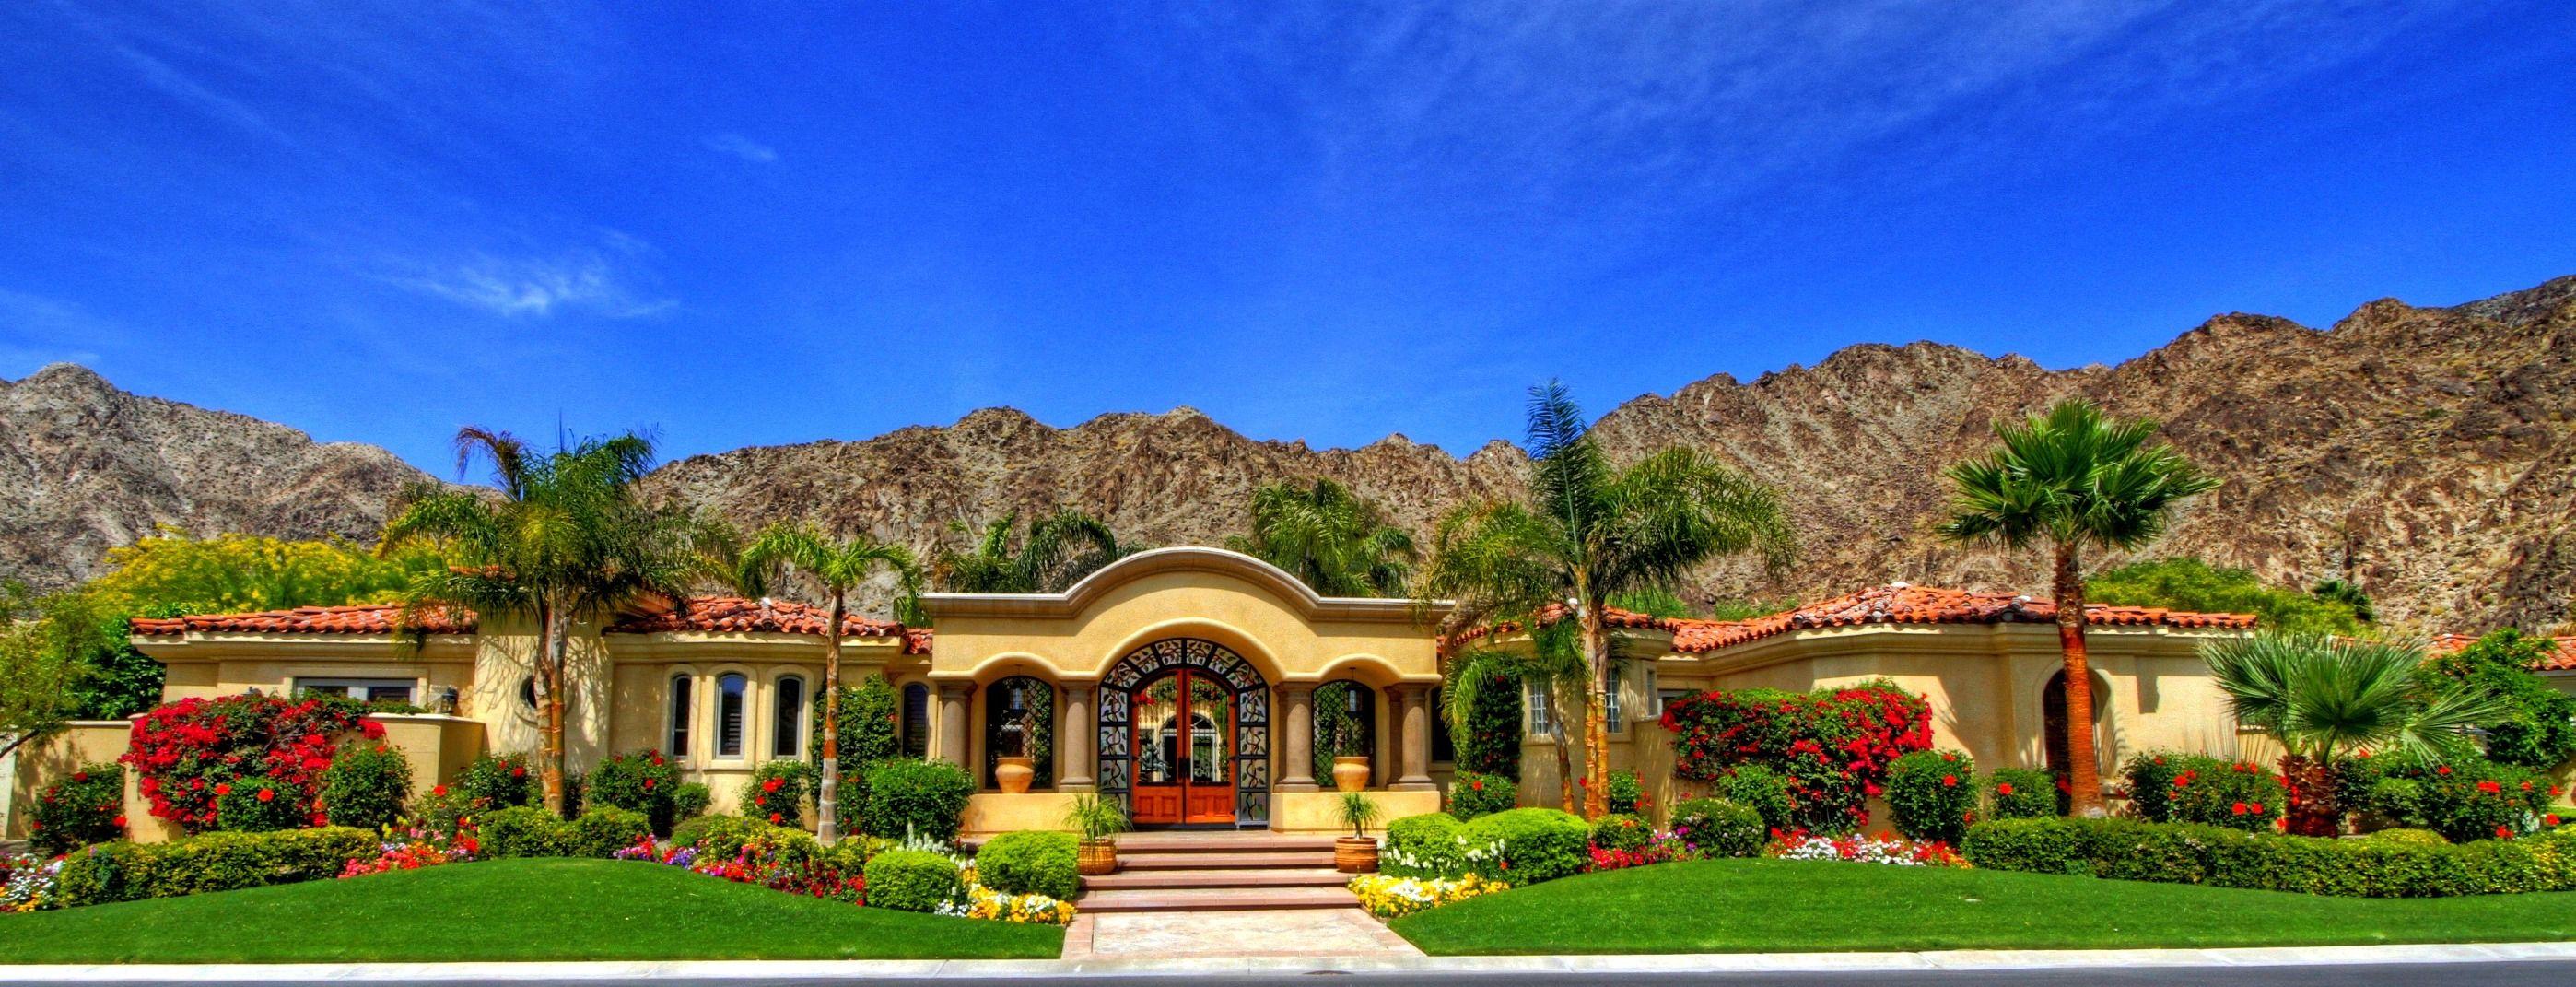 Luxury Homes In California | Photo Of Luxury Home In La Quinta, CA